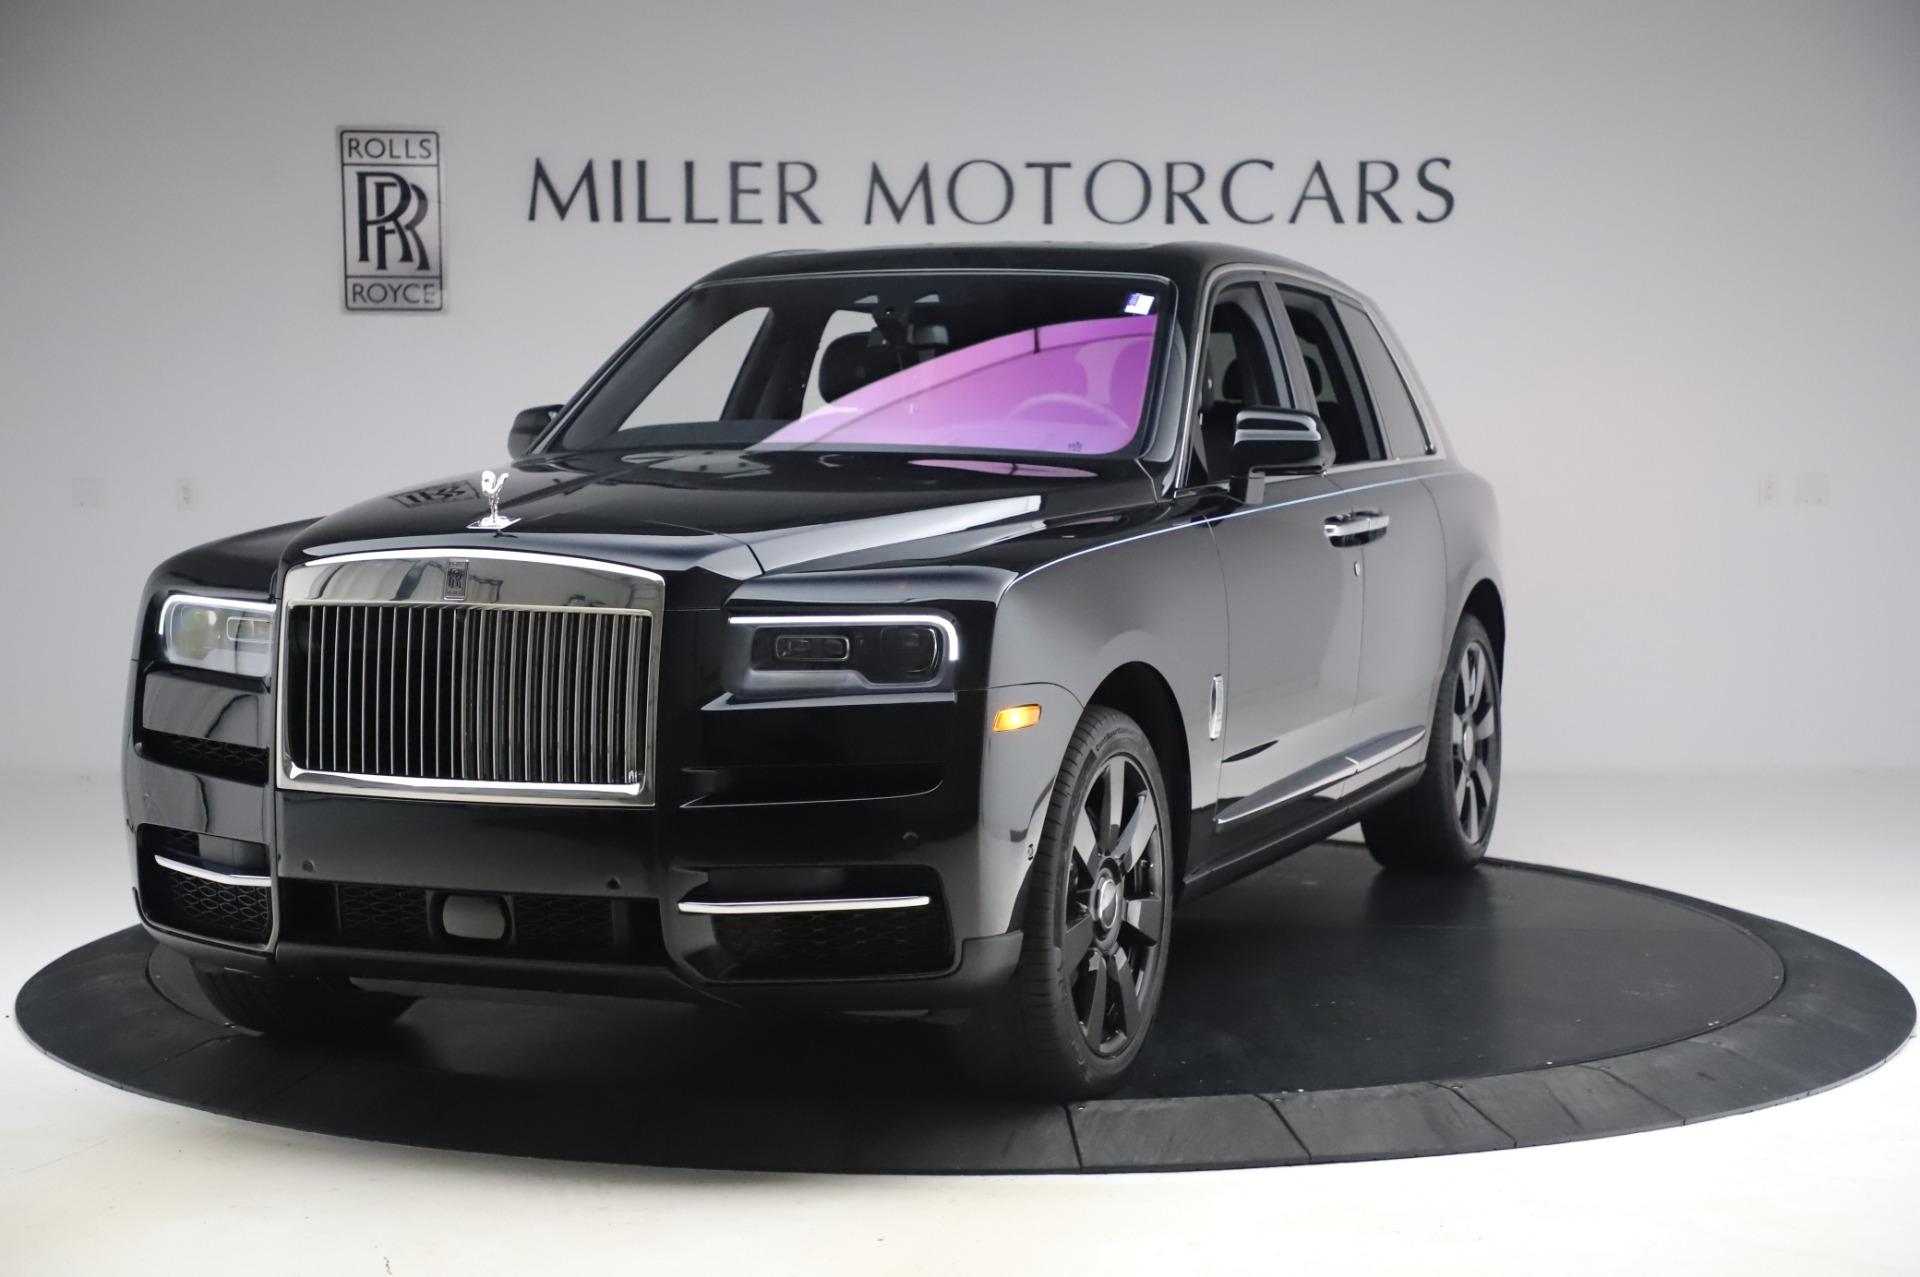 New 2021 Rolls-Royce Cullinan for sale $403,700 at McLaren Greenwich in Greenwich CT 06830 1